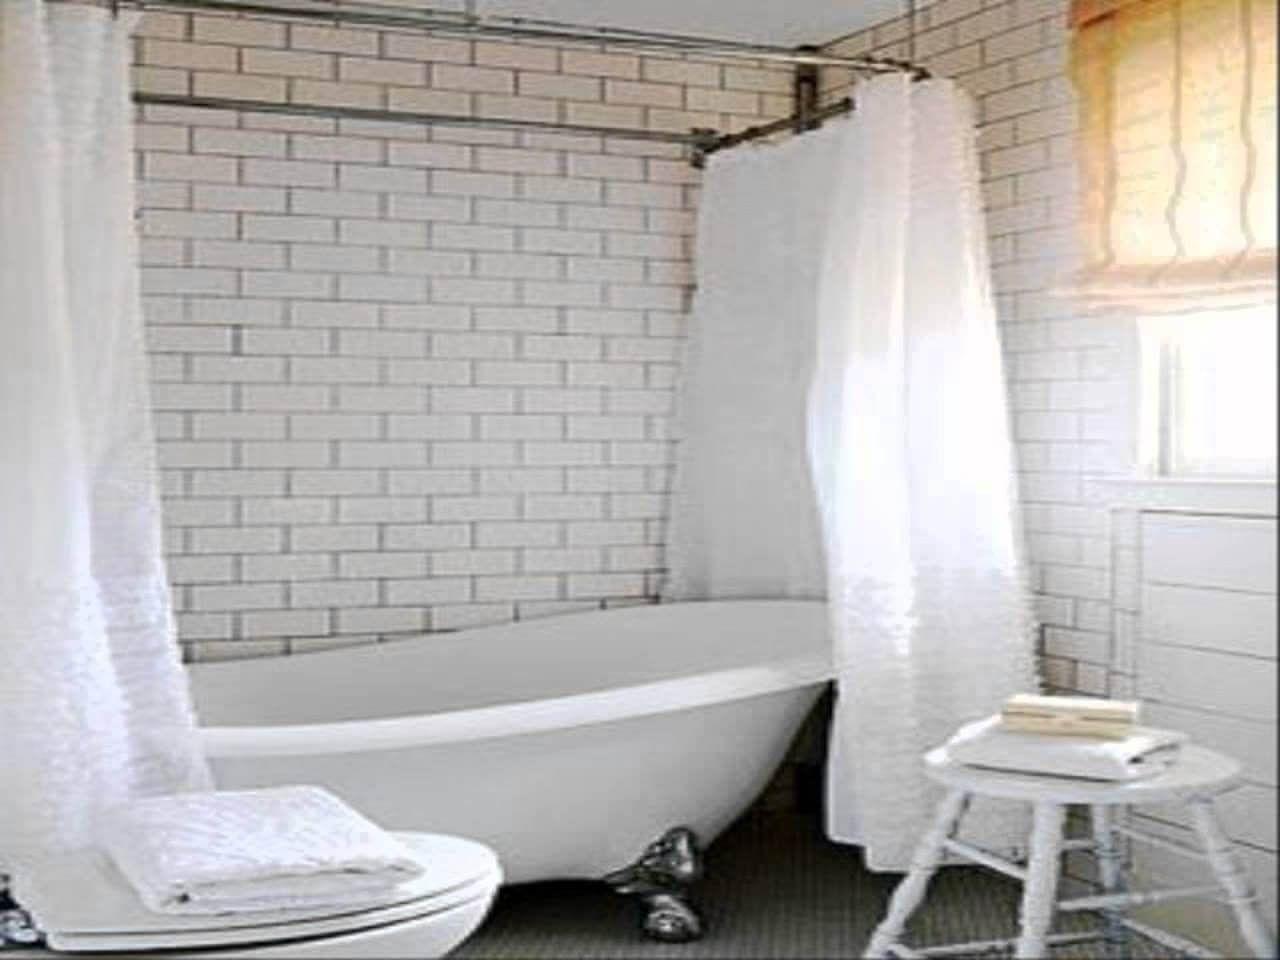 Clawfoot Tub Shower Curtain You Can Look Claw Tub Shower Curtain